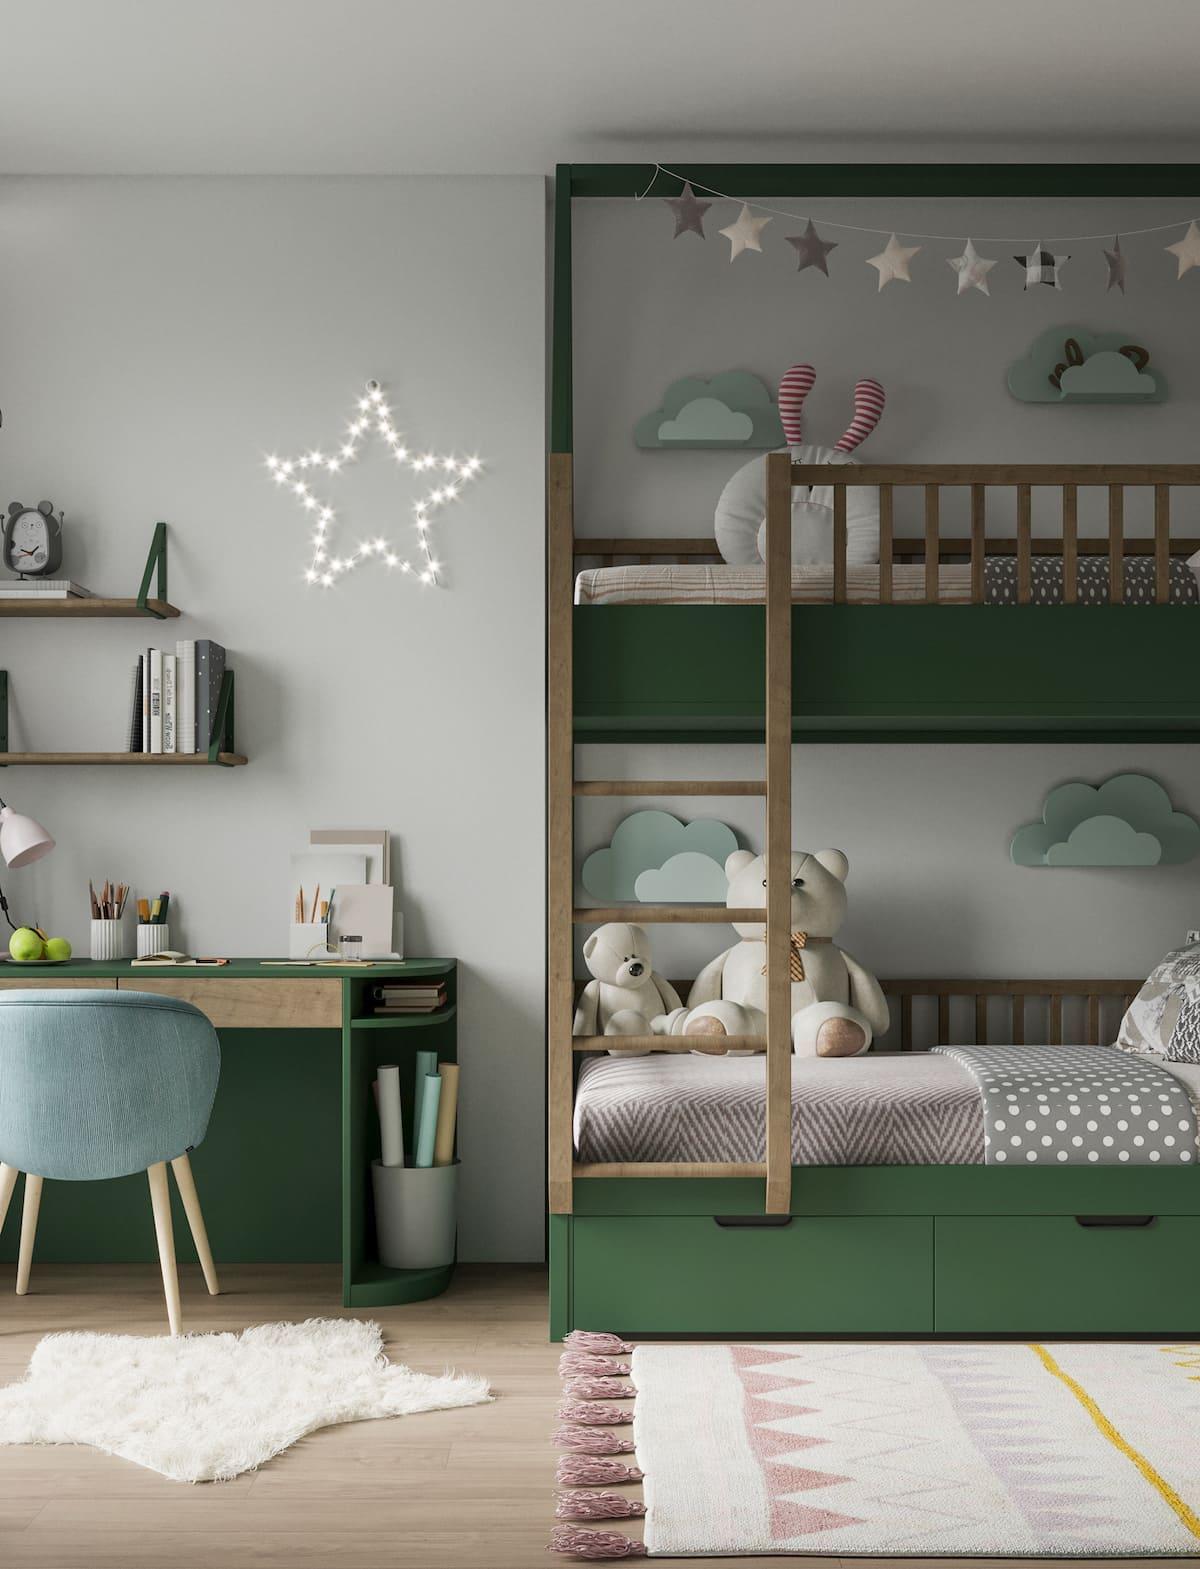 интерьер детской комнаты фото 2